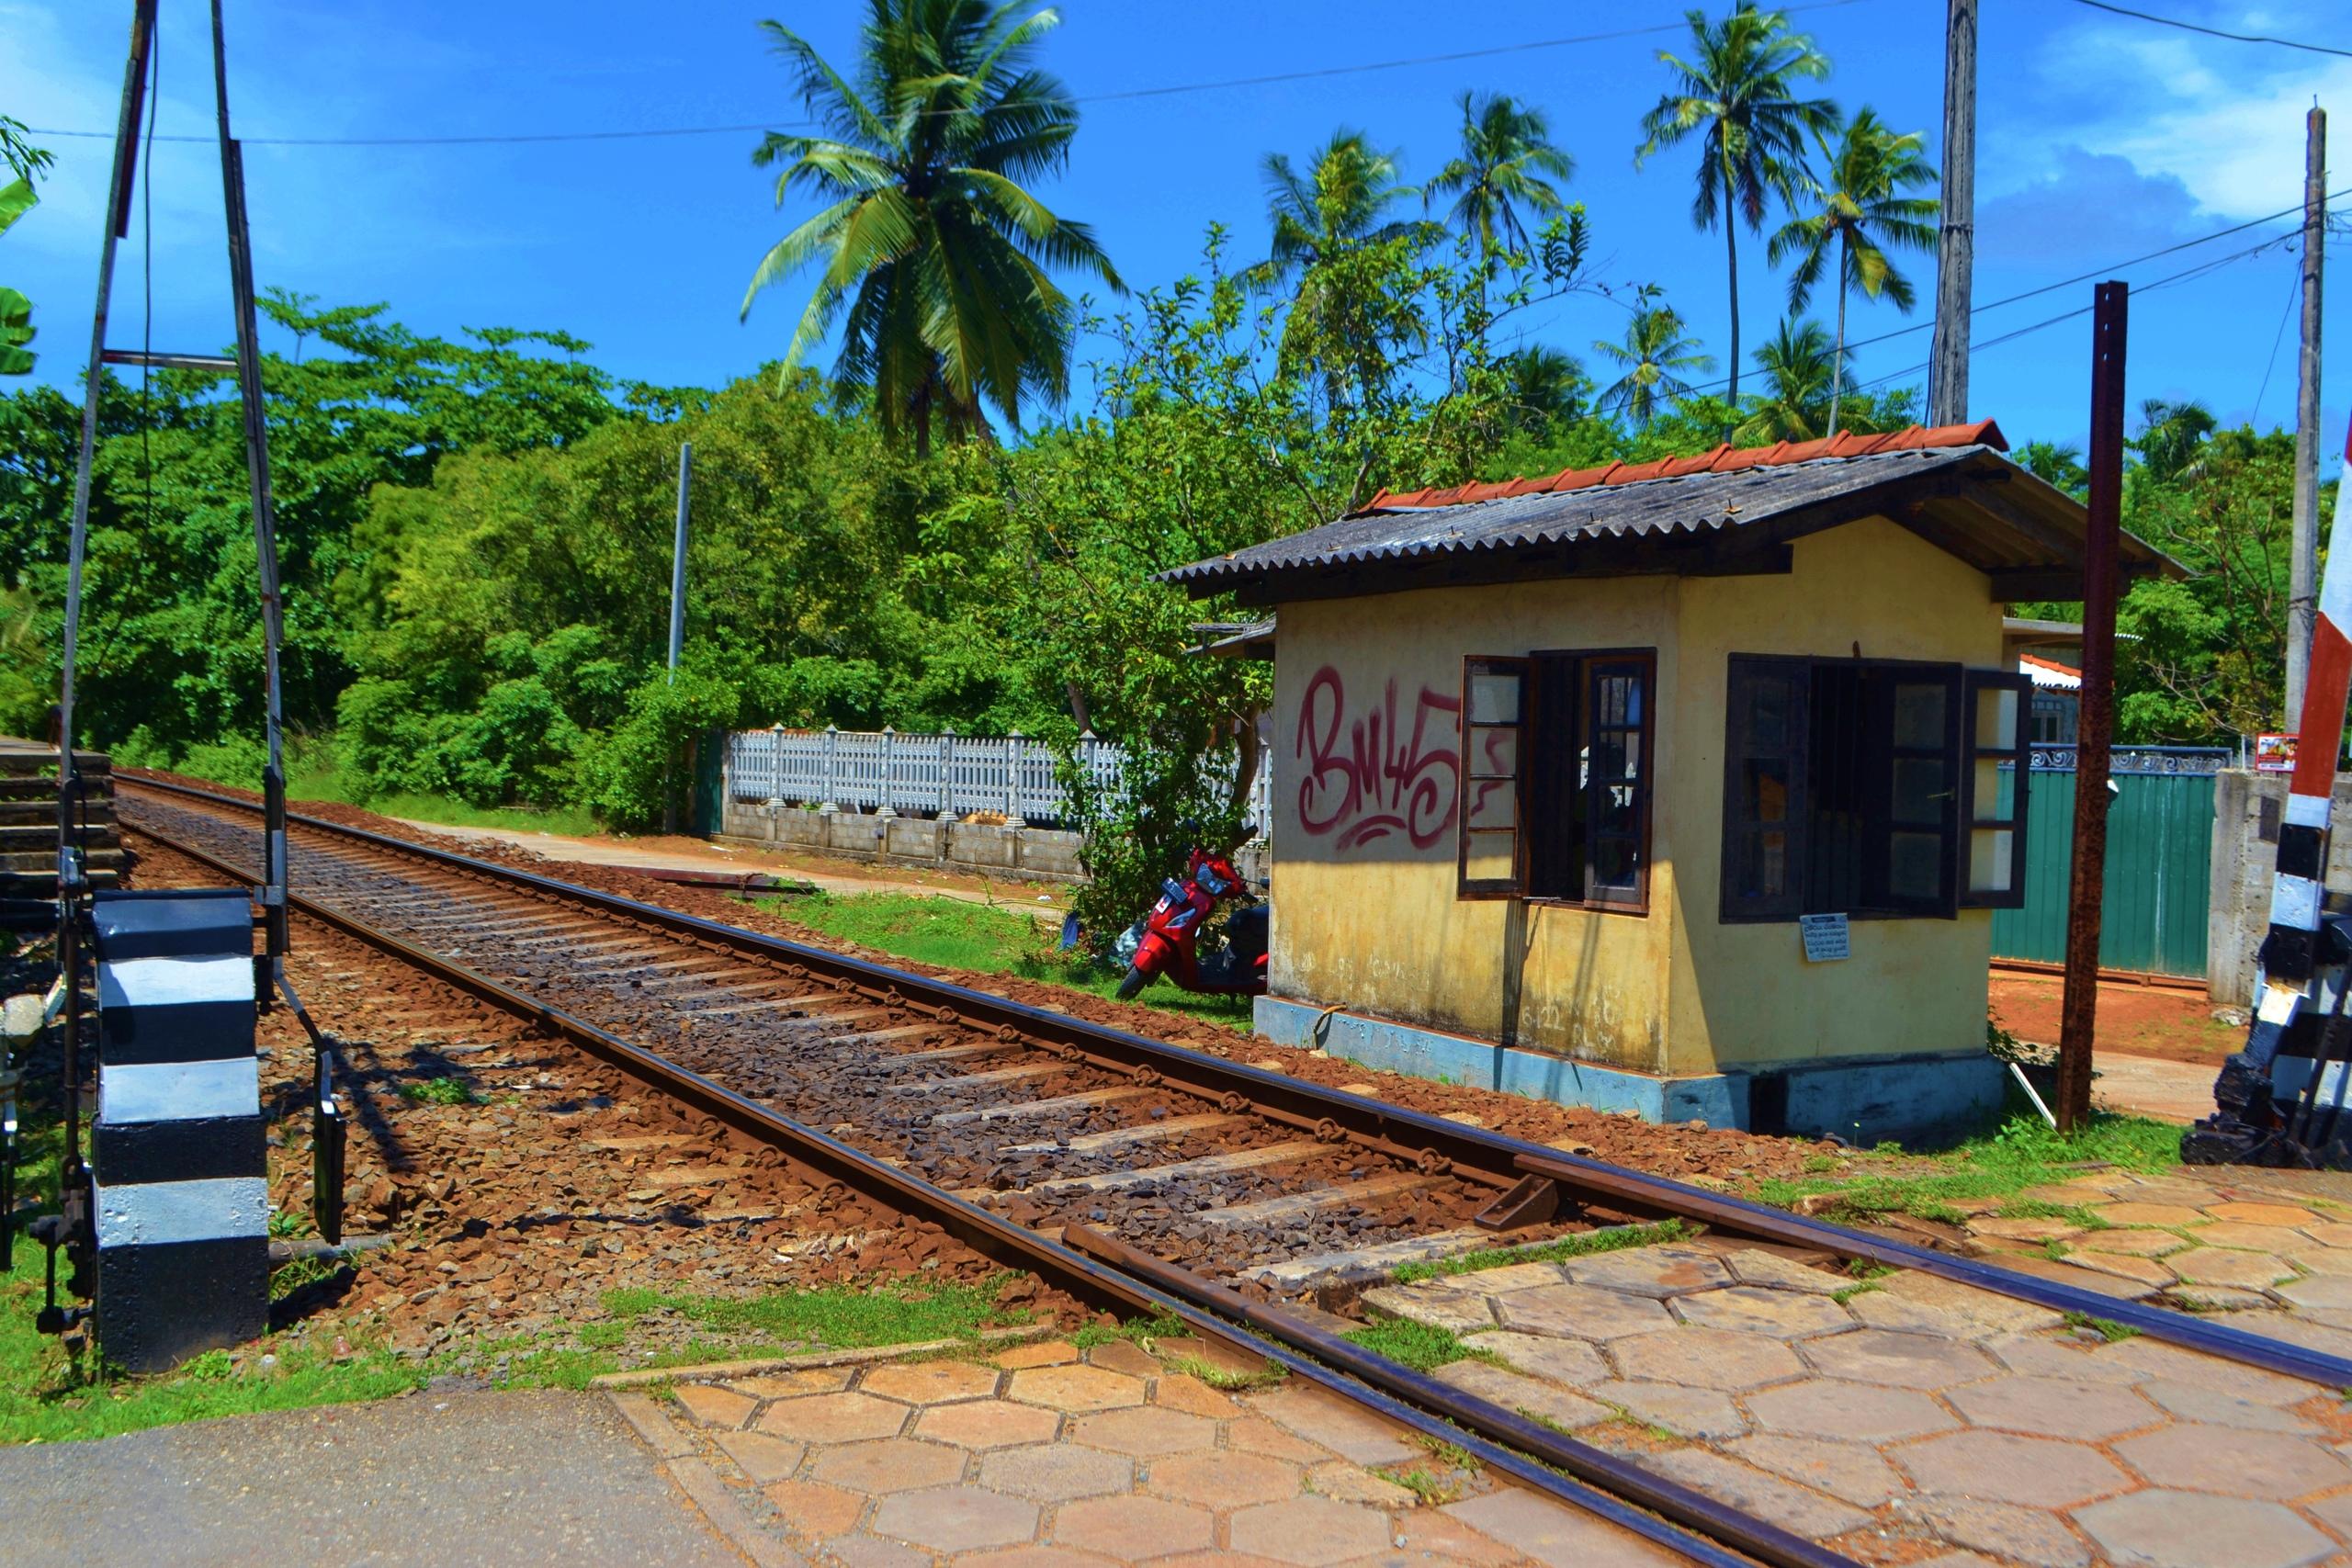 Шри Ланка (фото) - Страница 2 TaQQ2Wor6-Y